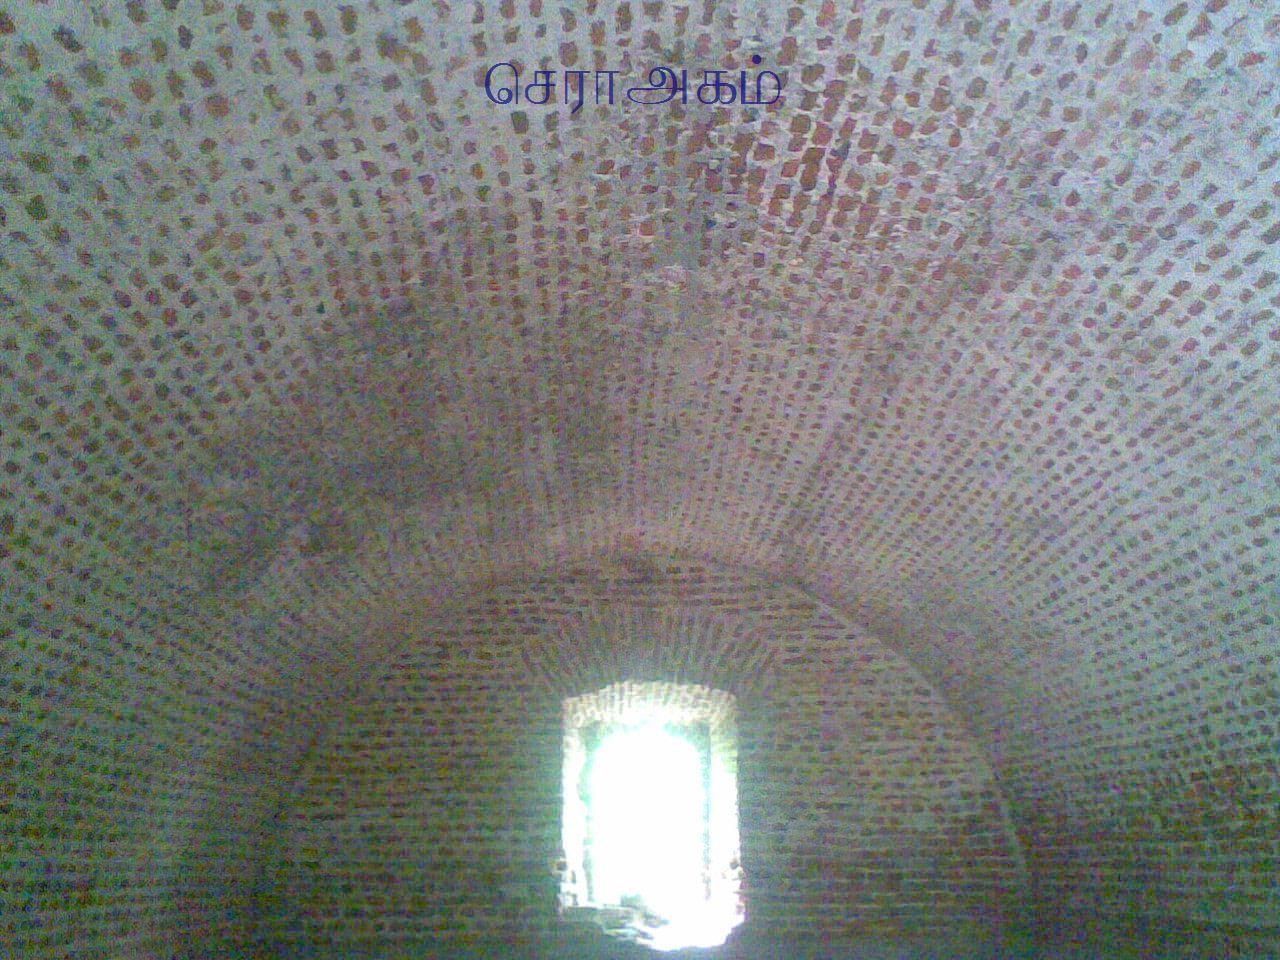 http://3.bp.blogspot.com/-XOs9-2GpV7k/ThJbtZT-HGI/AAAAAAAAC_c/Z6U4Qz_TLPc/s1600/Image113.jpg